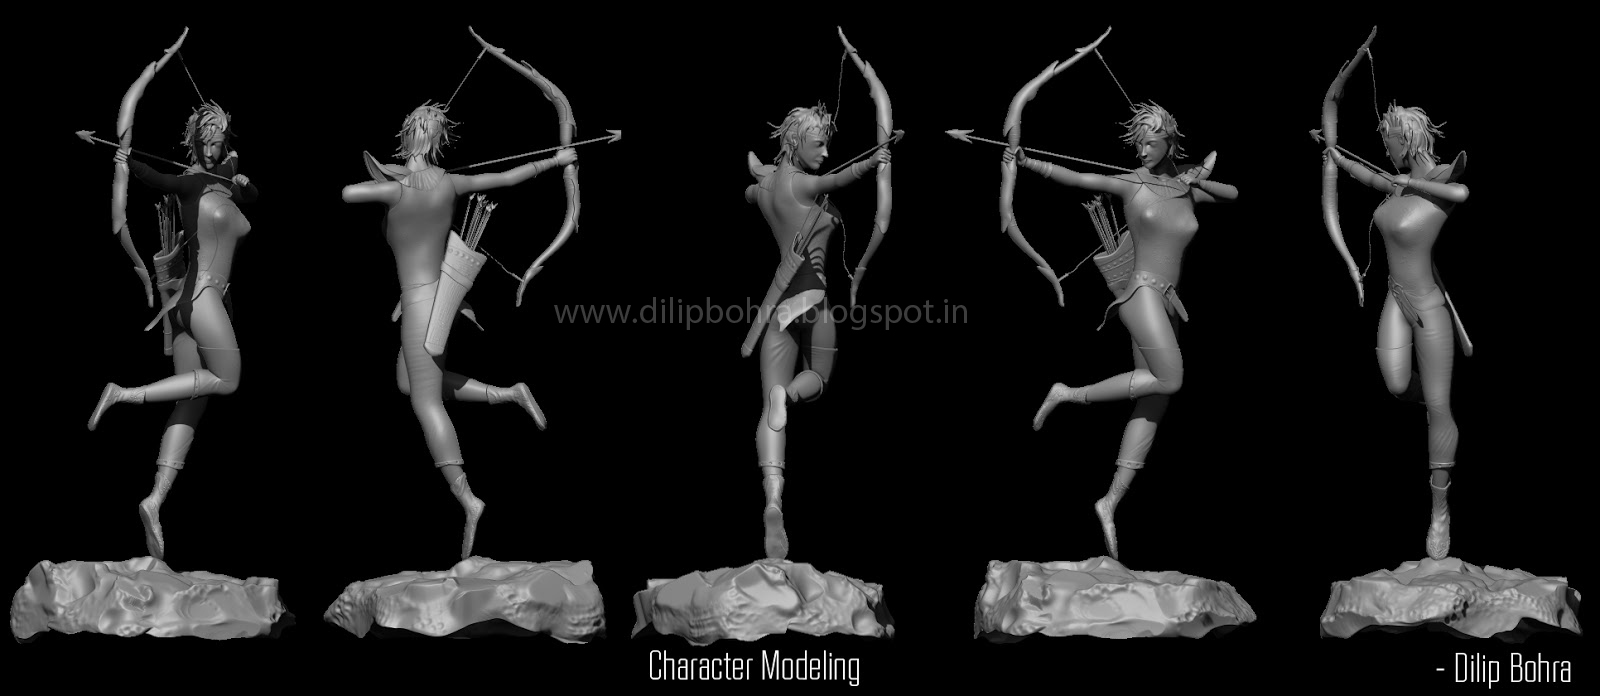 Dilip Bohra: Character modeling - Maya & Zbrush: dilipbohra.blogspot.com/2013/07/character-modeling-maya-zbrush.html